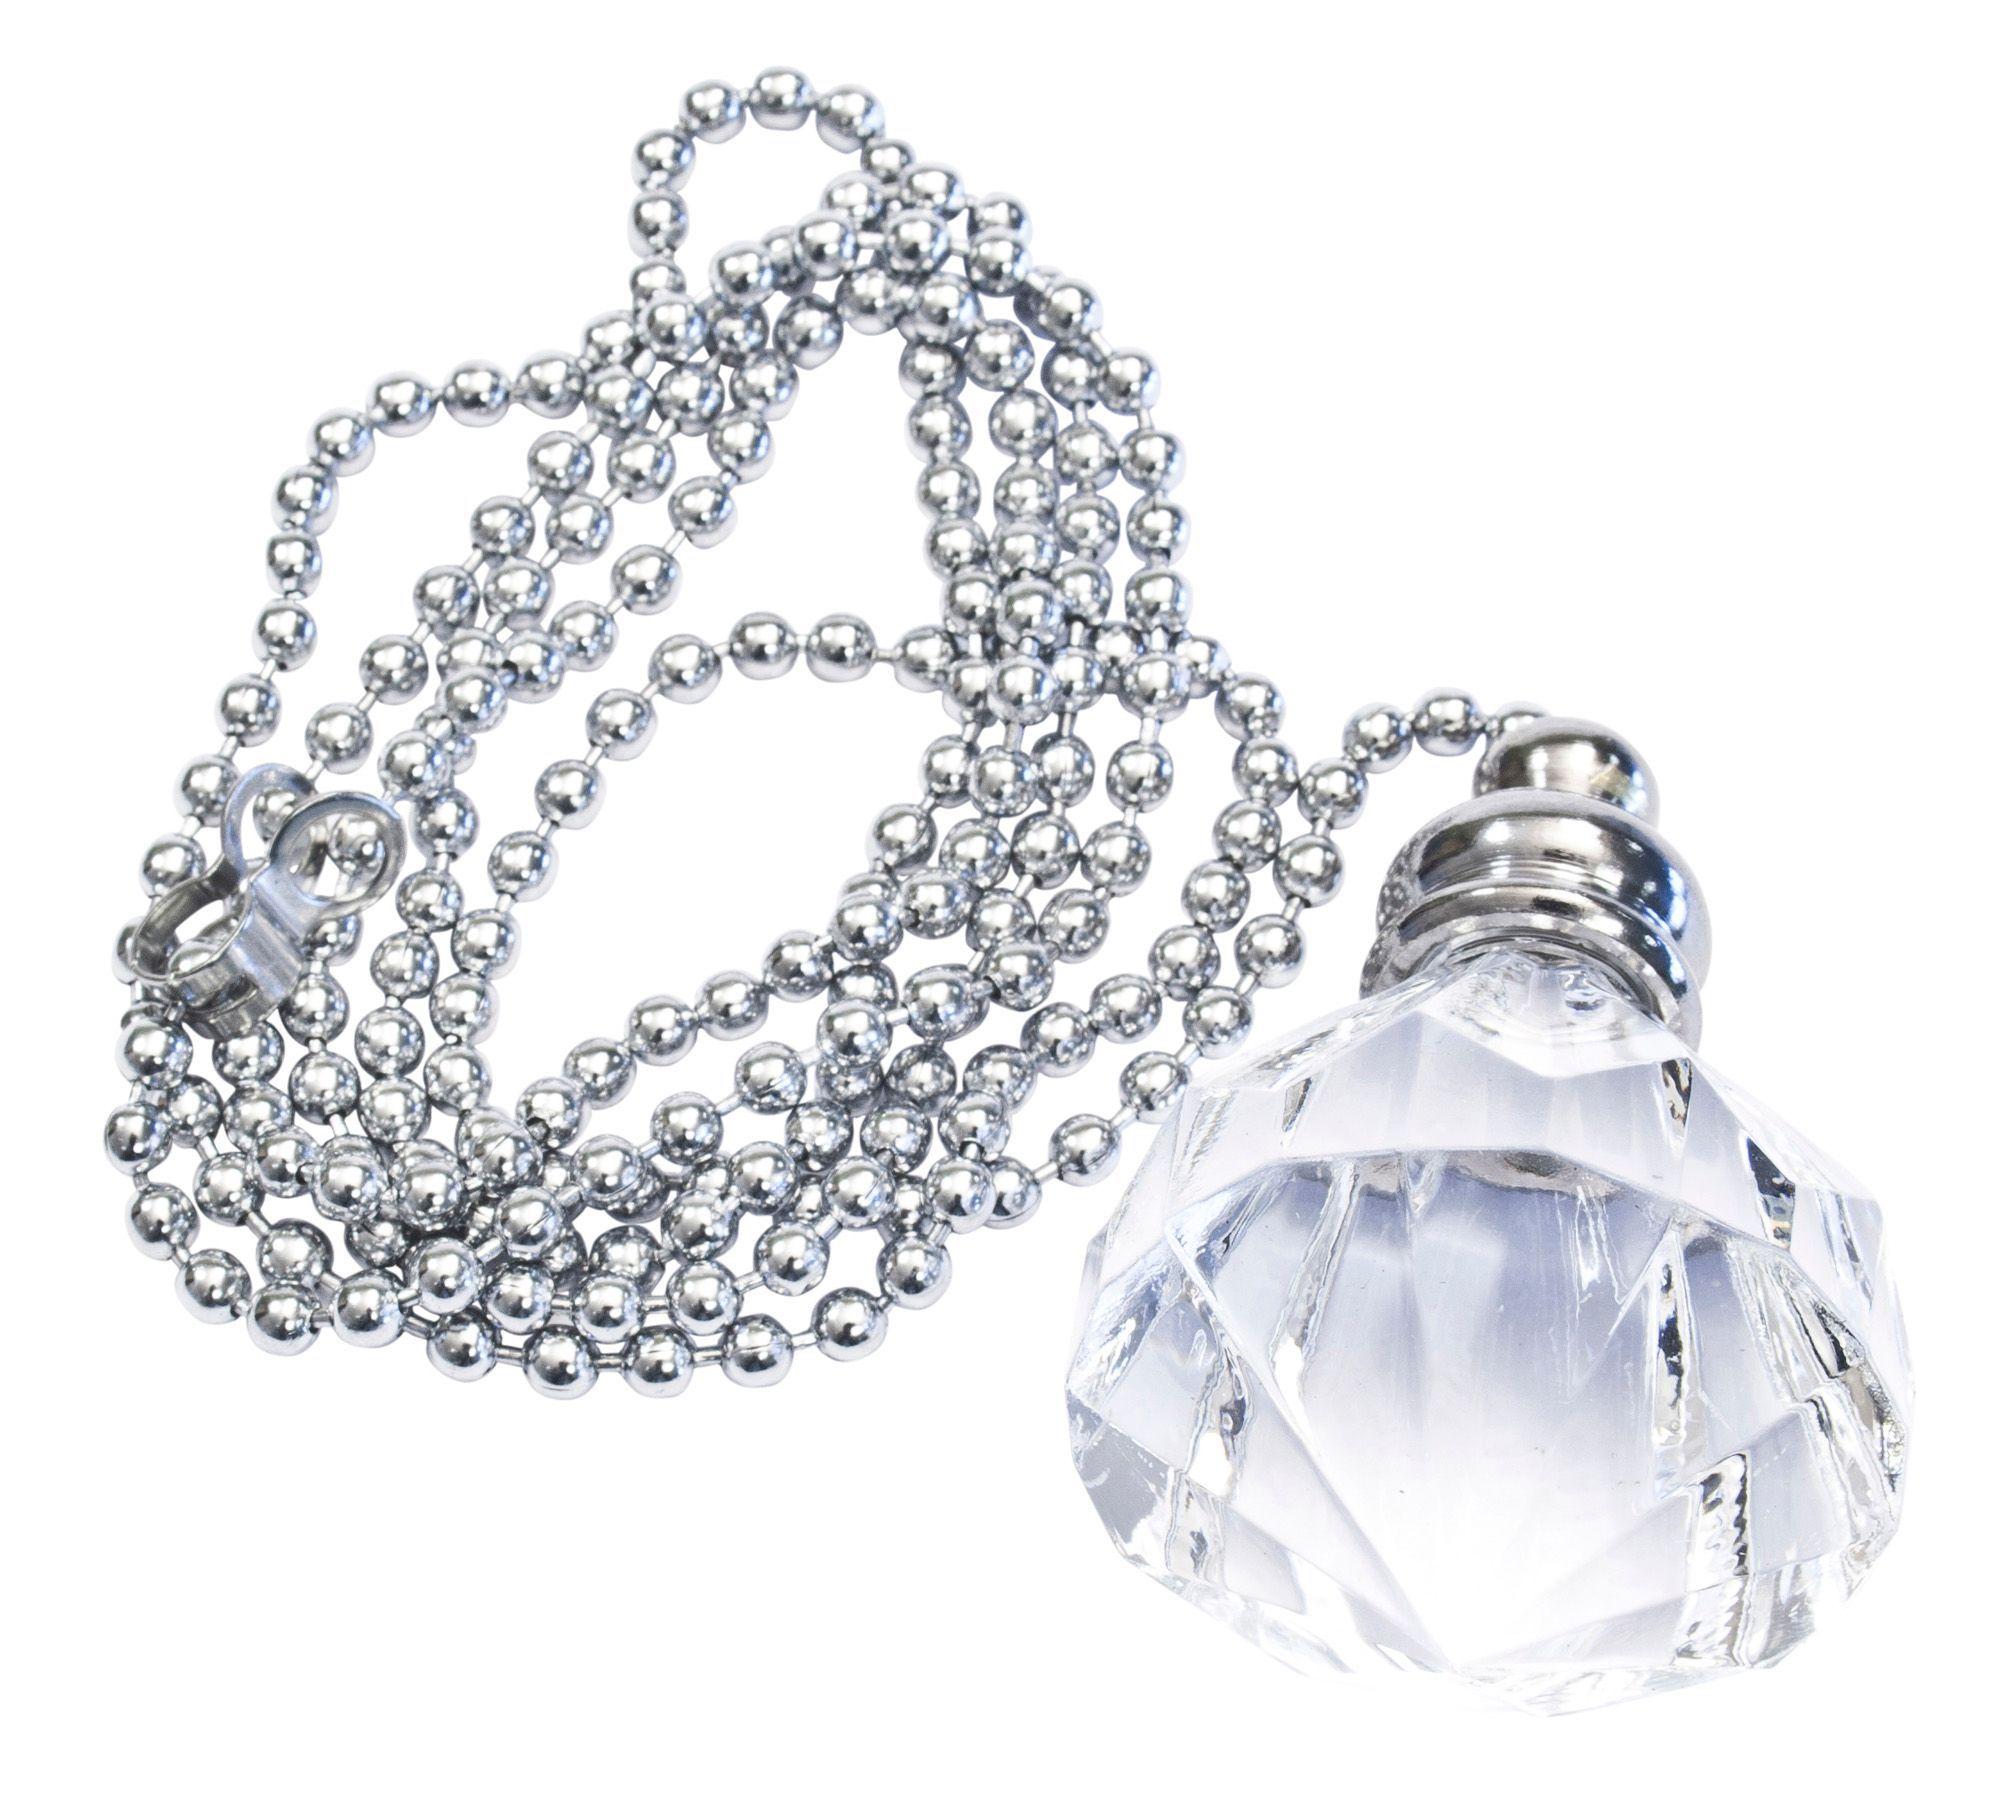 Bathroom Light Switches B&Q b&q silver diamond crystal effect acrylic light pull | departments